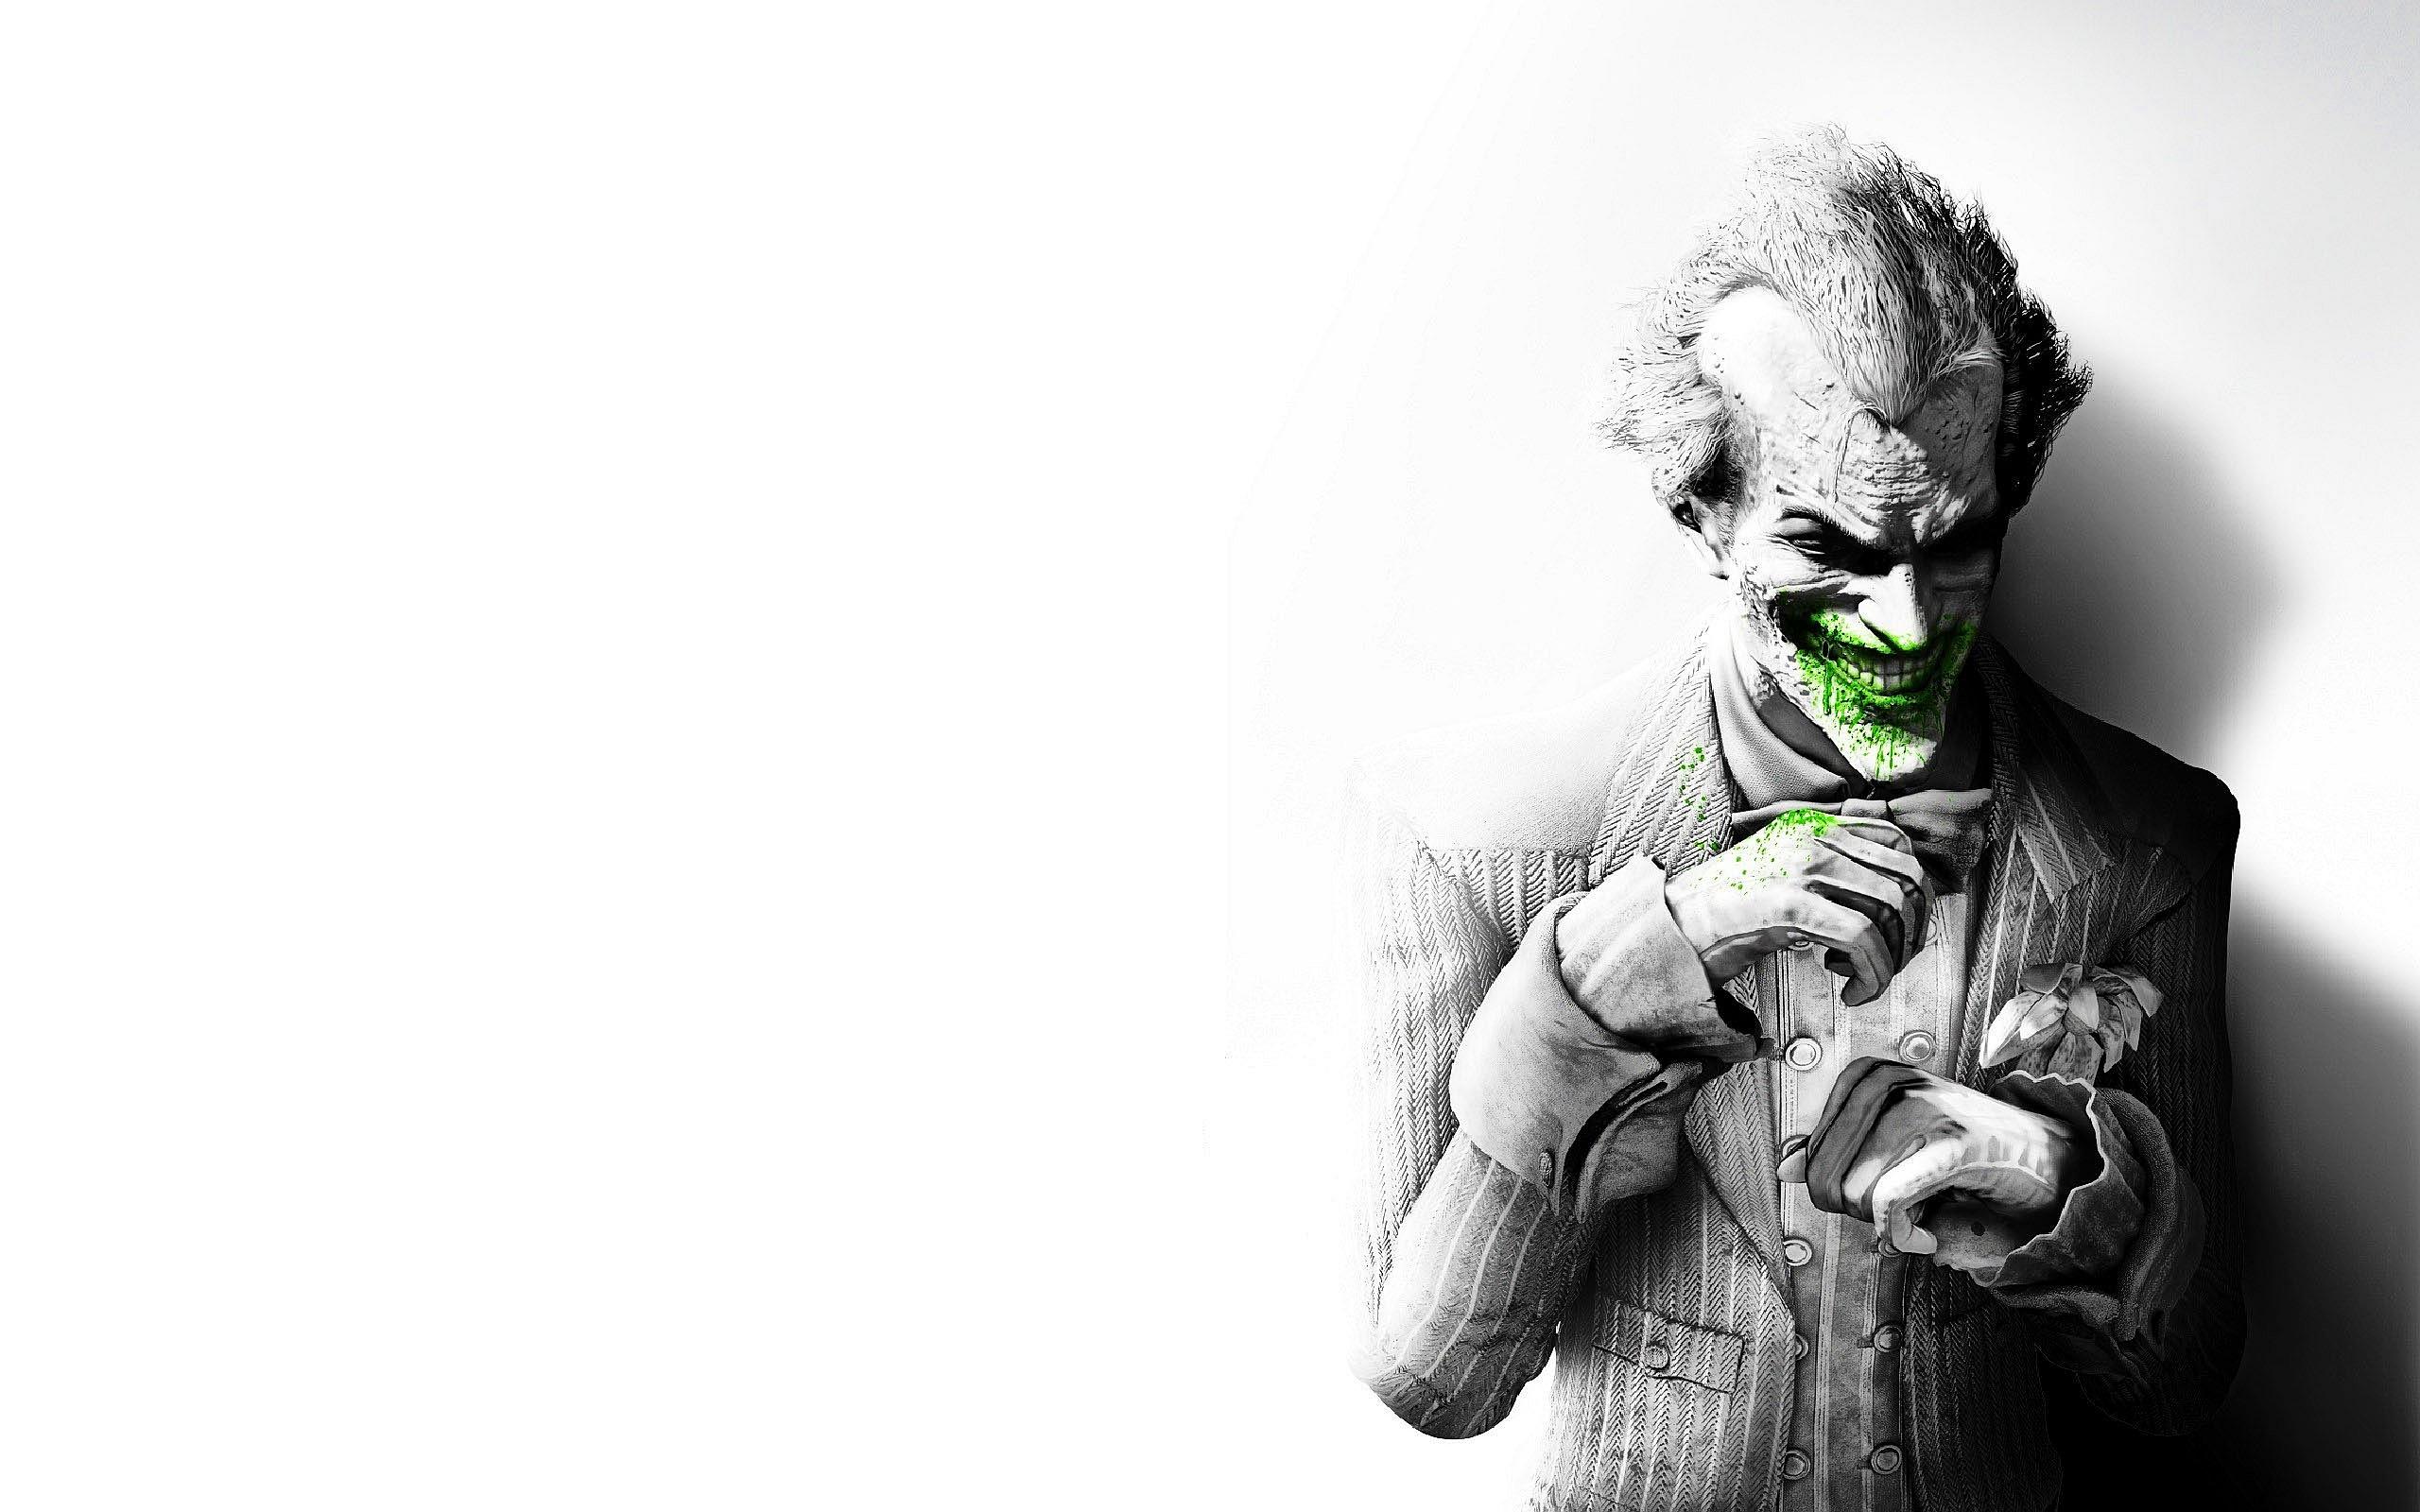 Download 85 Joker Wallpaper The Dark Knight The 2560x1600